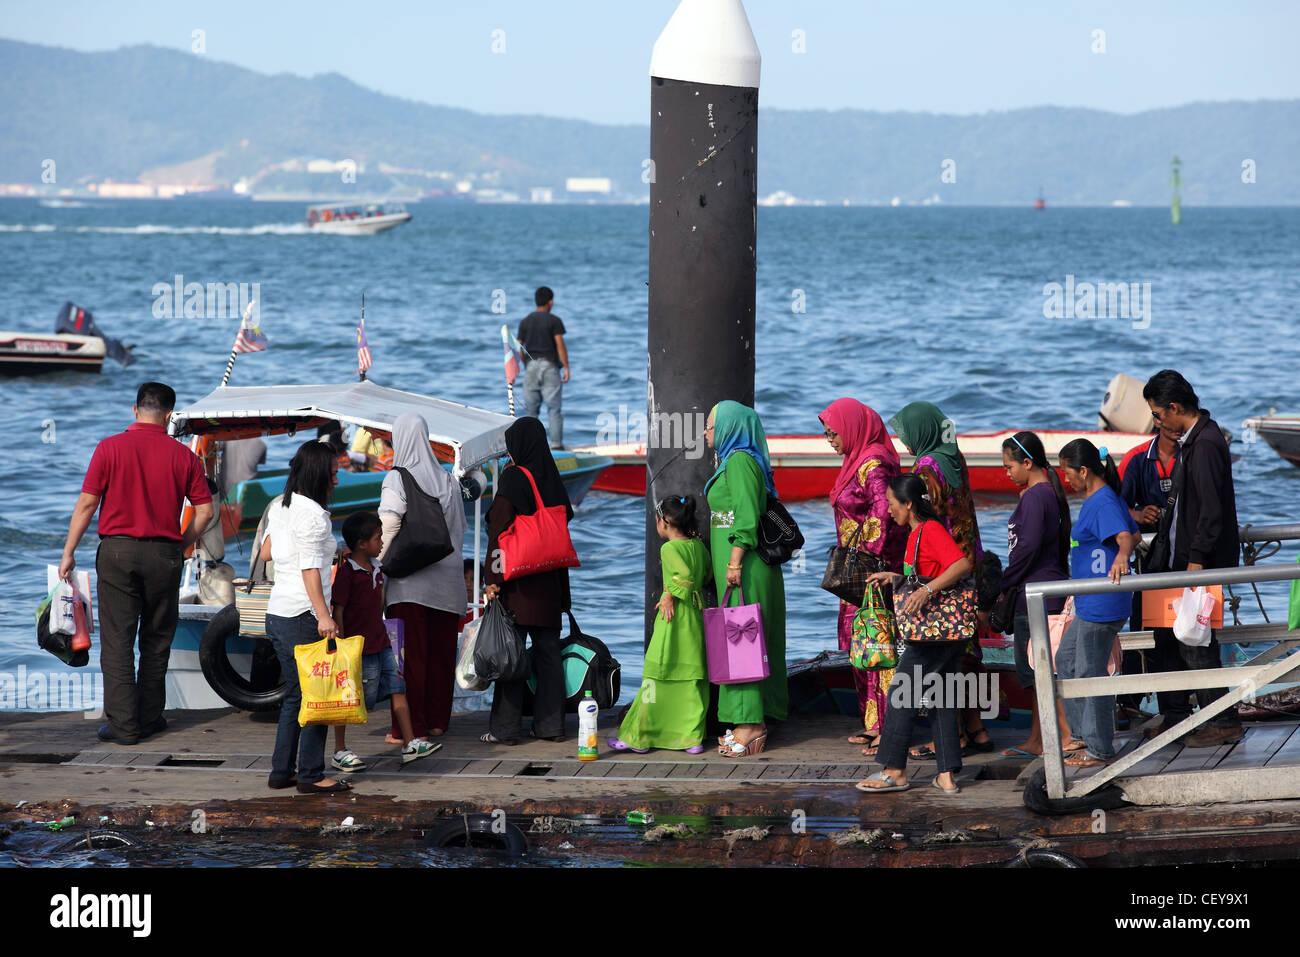 Passengers boarding water taxi on the waterfront. Kota Kinabalu, Sabah, Borneo, Malaysia, South-East Asia, Asia - Stock Image